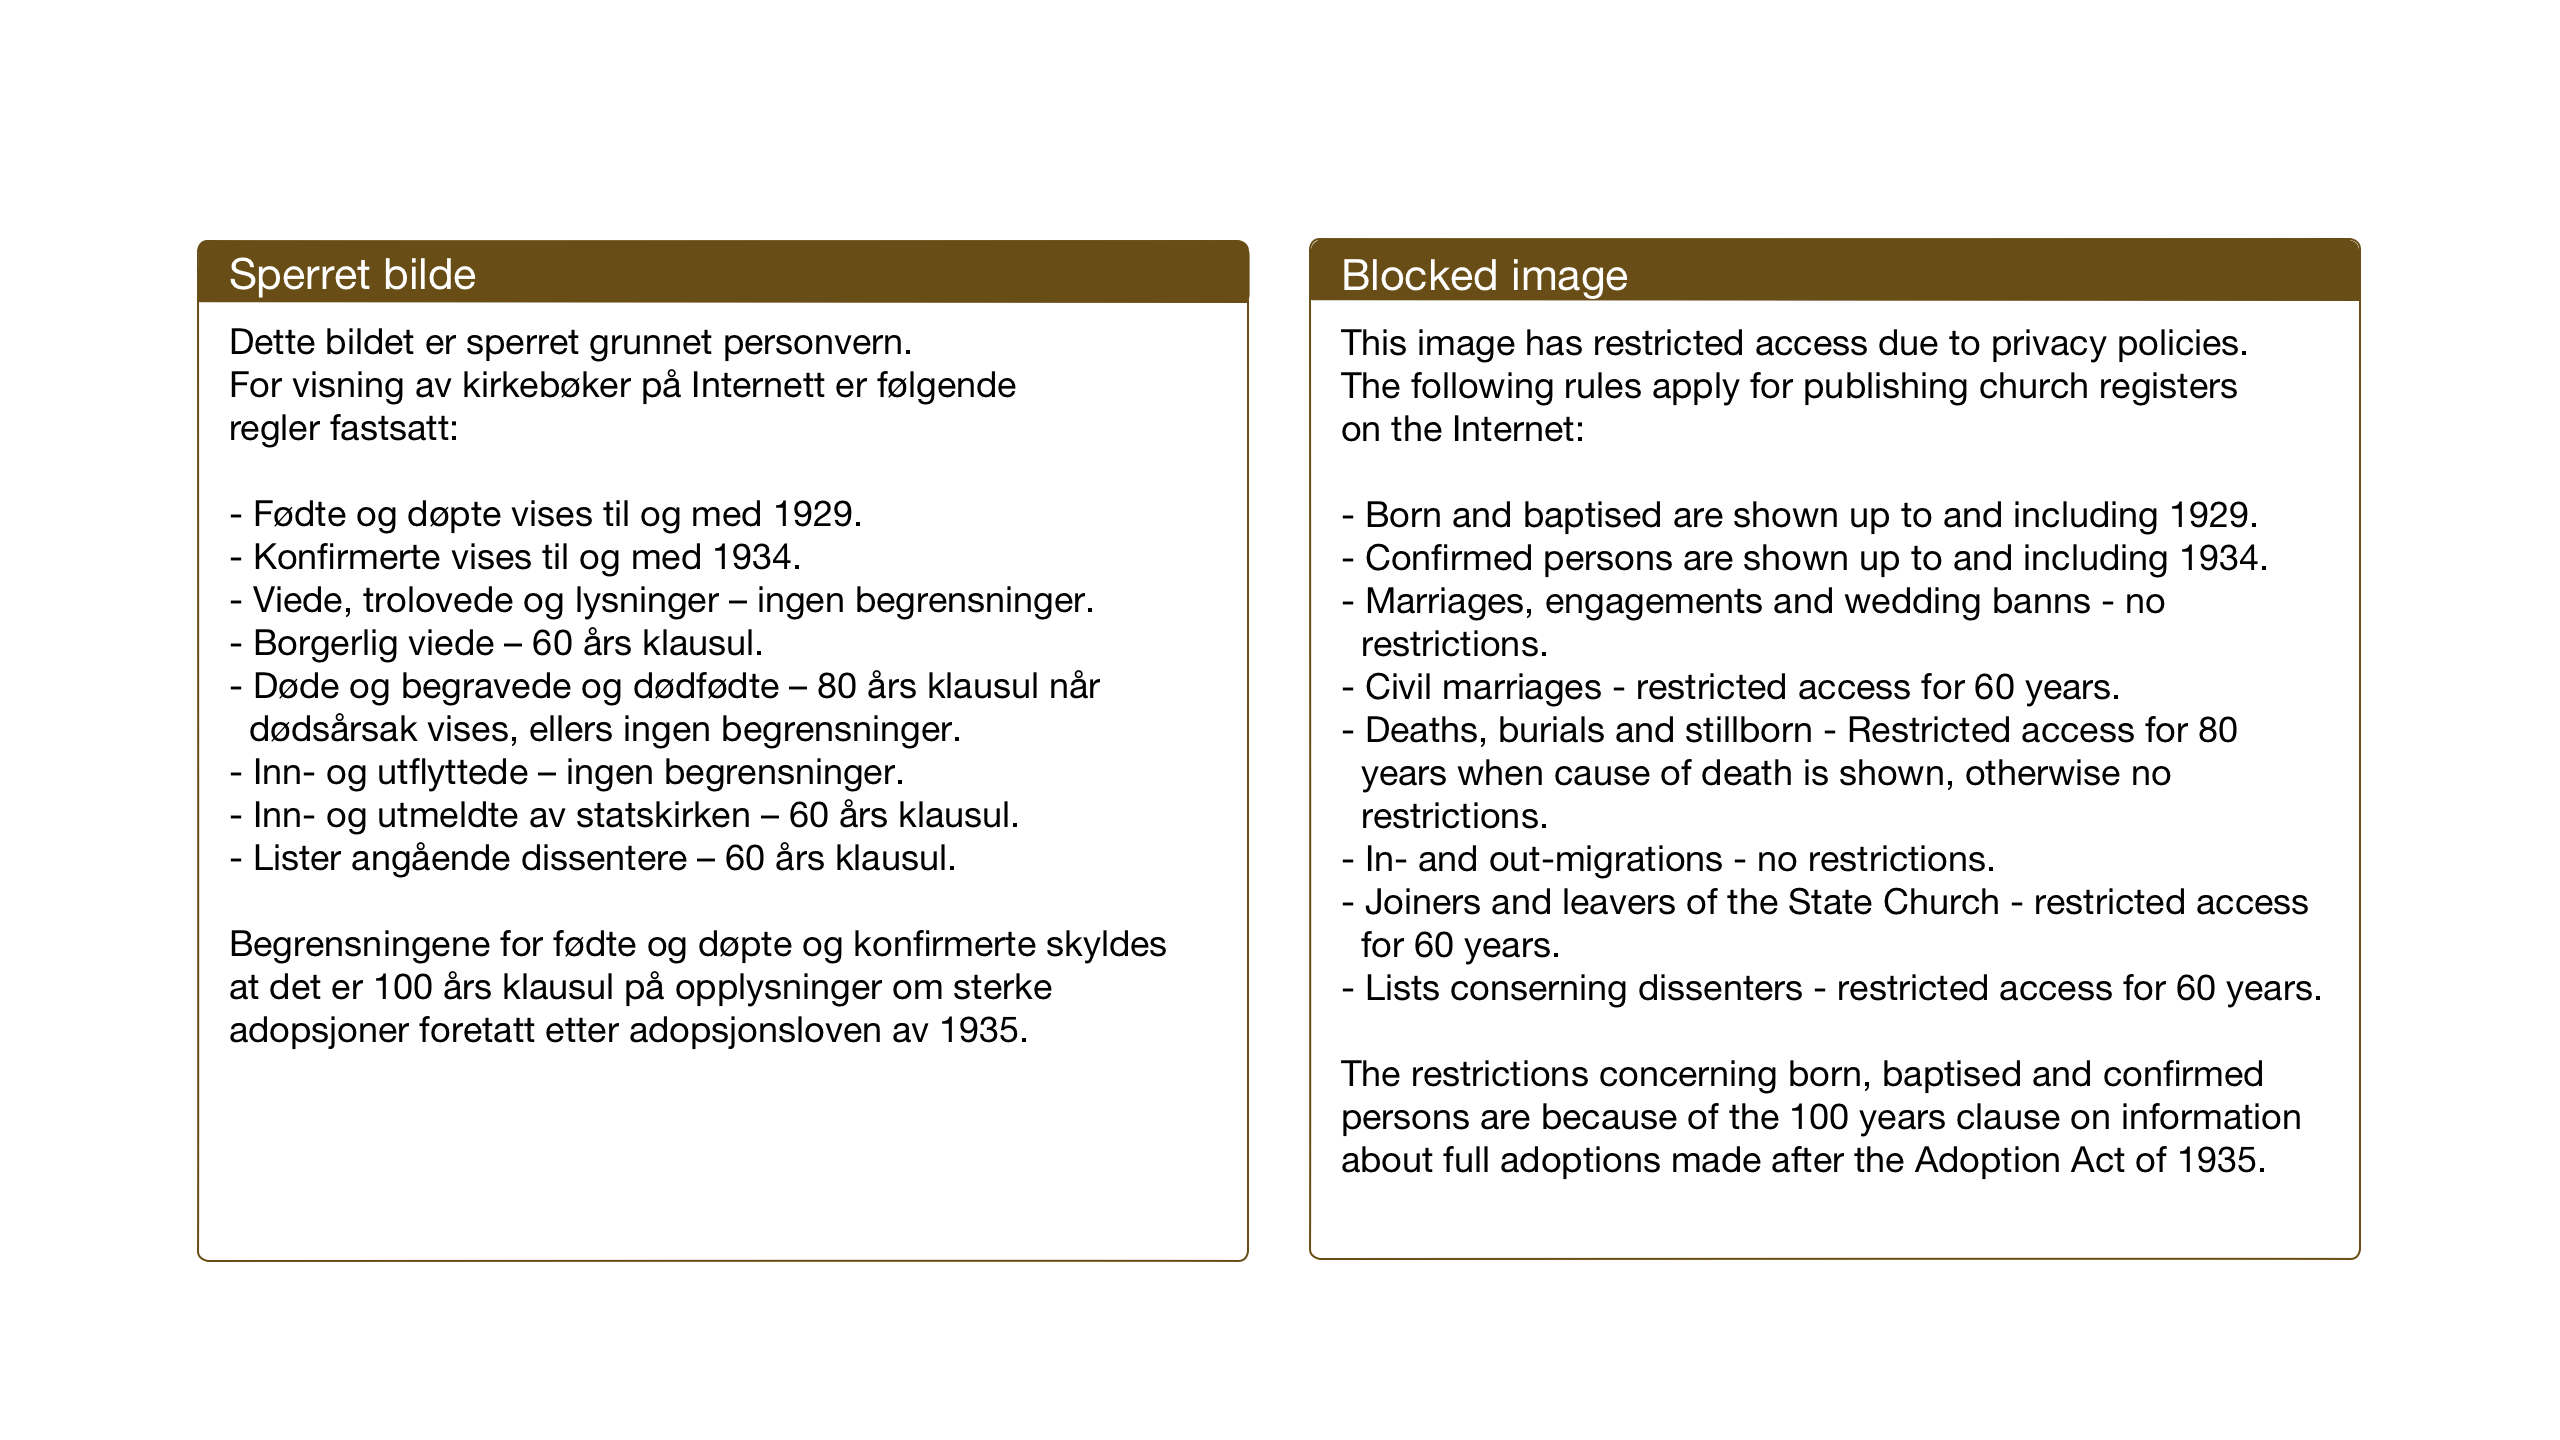 SAT, Ministerialprotokoller, klokkerbøker og fødselsregistre - Nordland, 882/L1183: Klokkerbok nr. 882C01, 1911-1938, s. 219